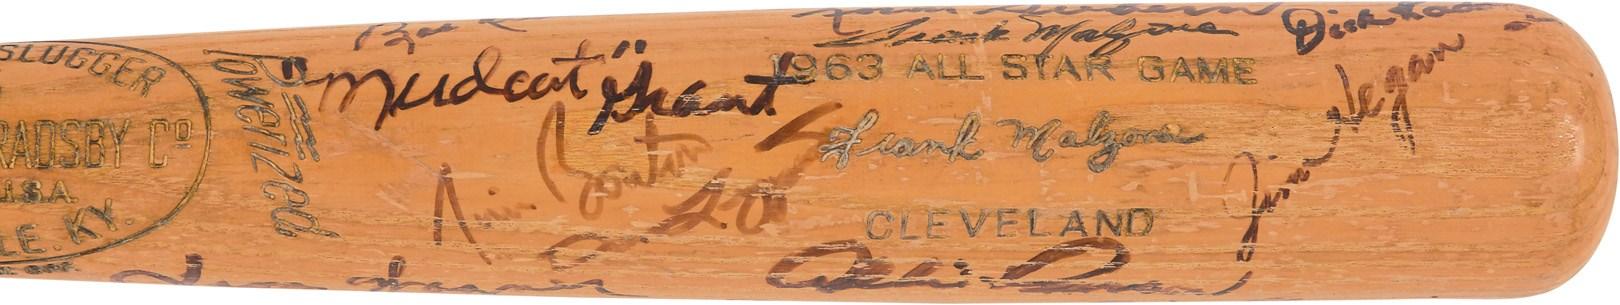 Baseball Autographs - Leland's Classic